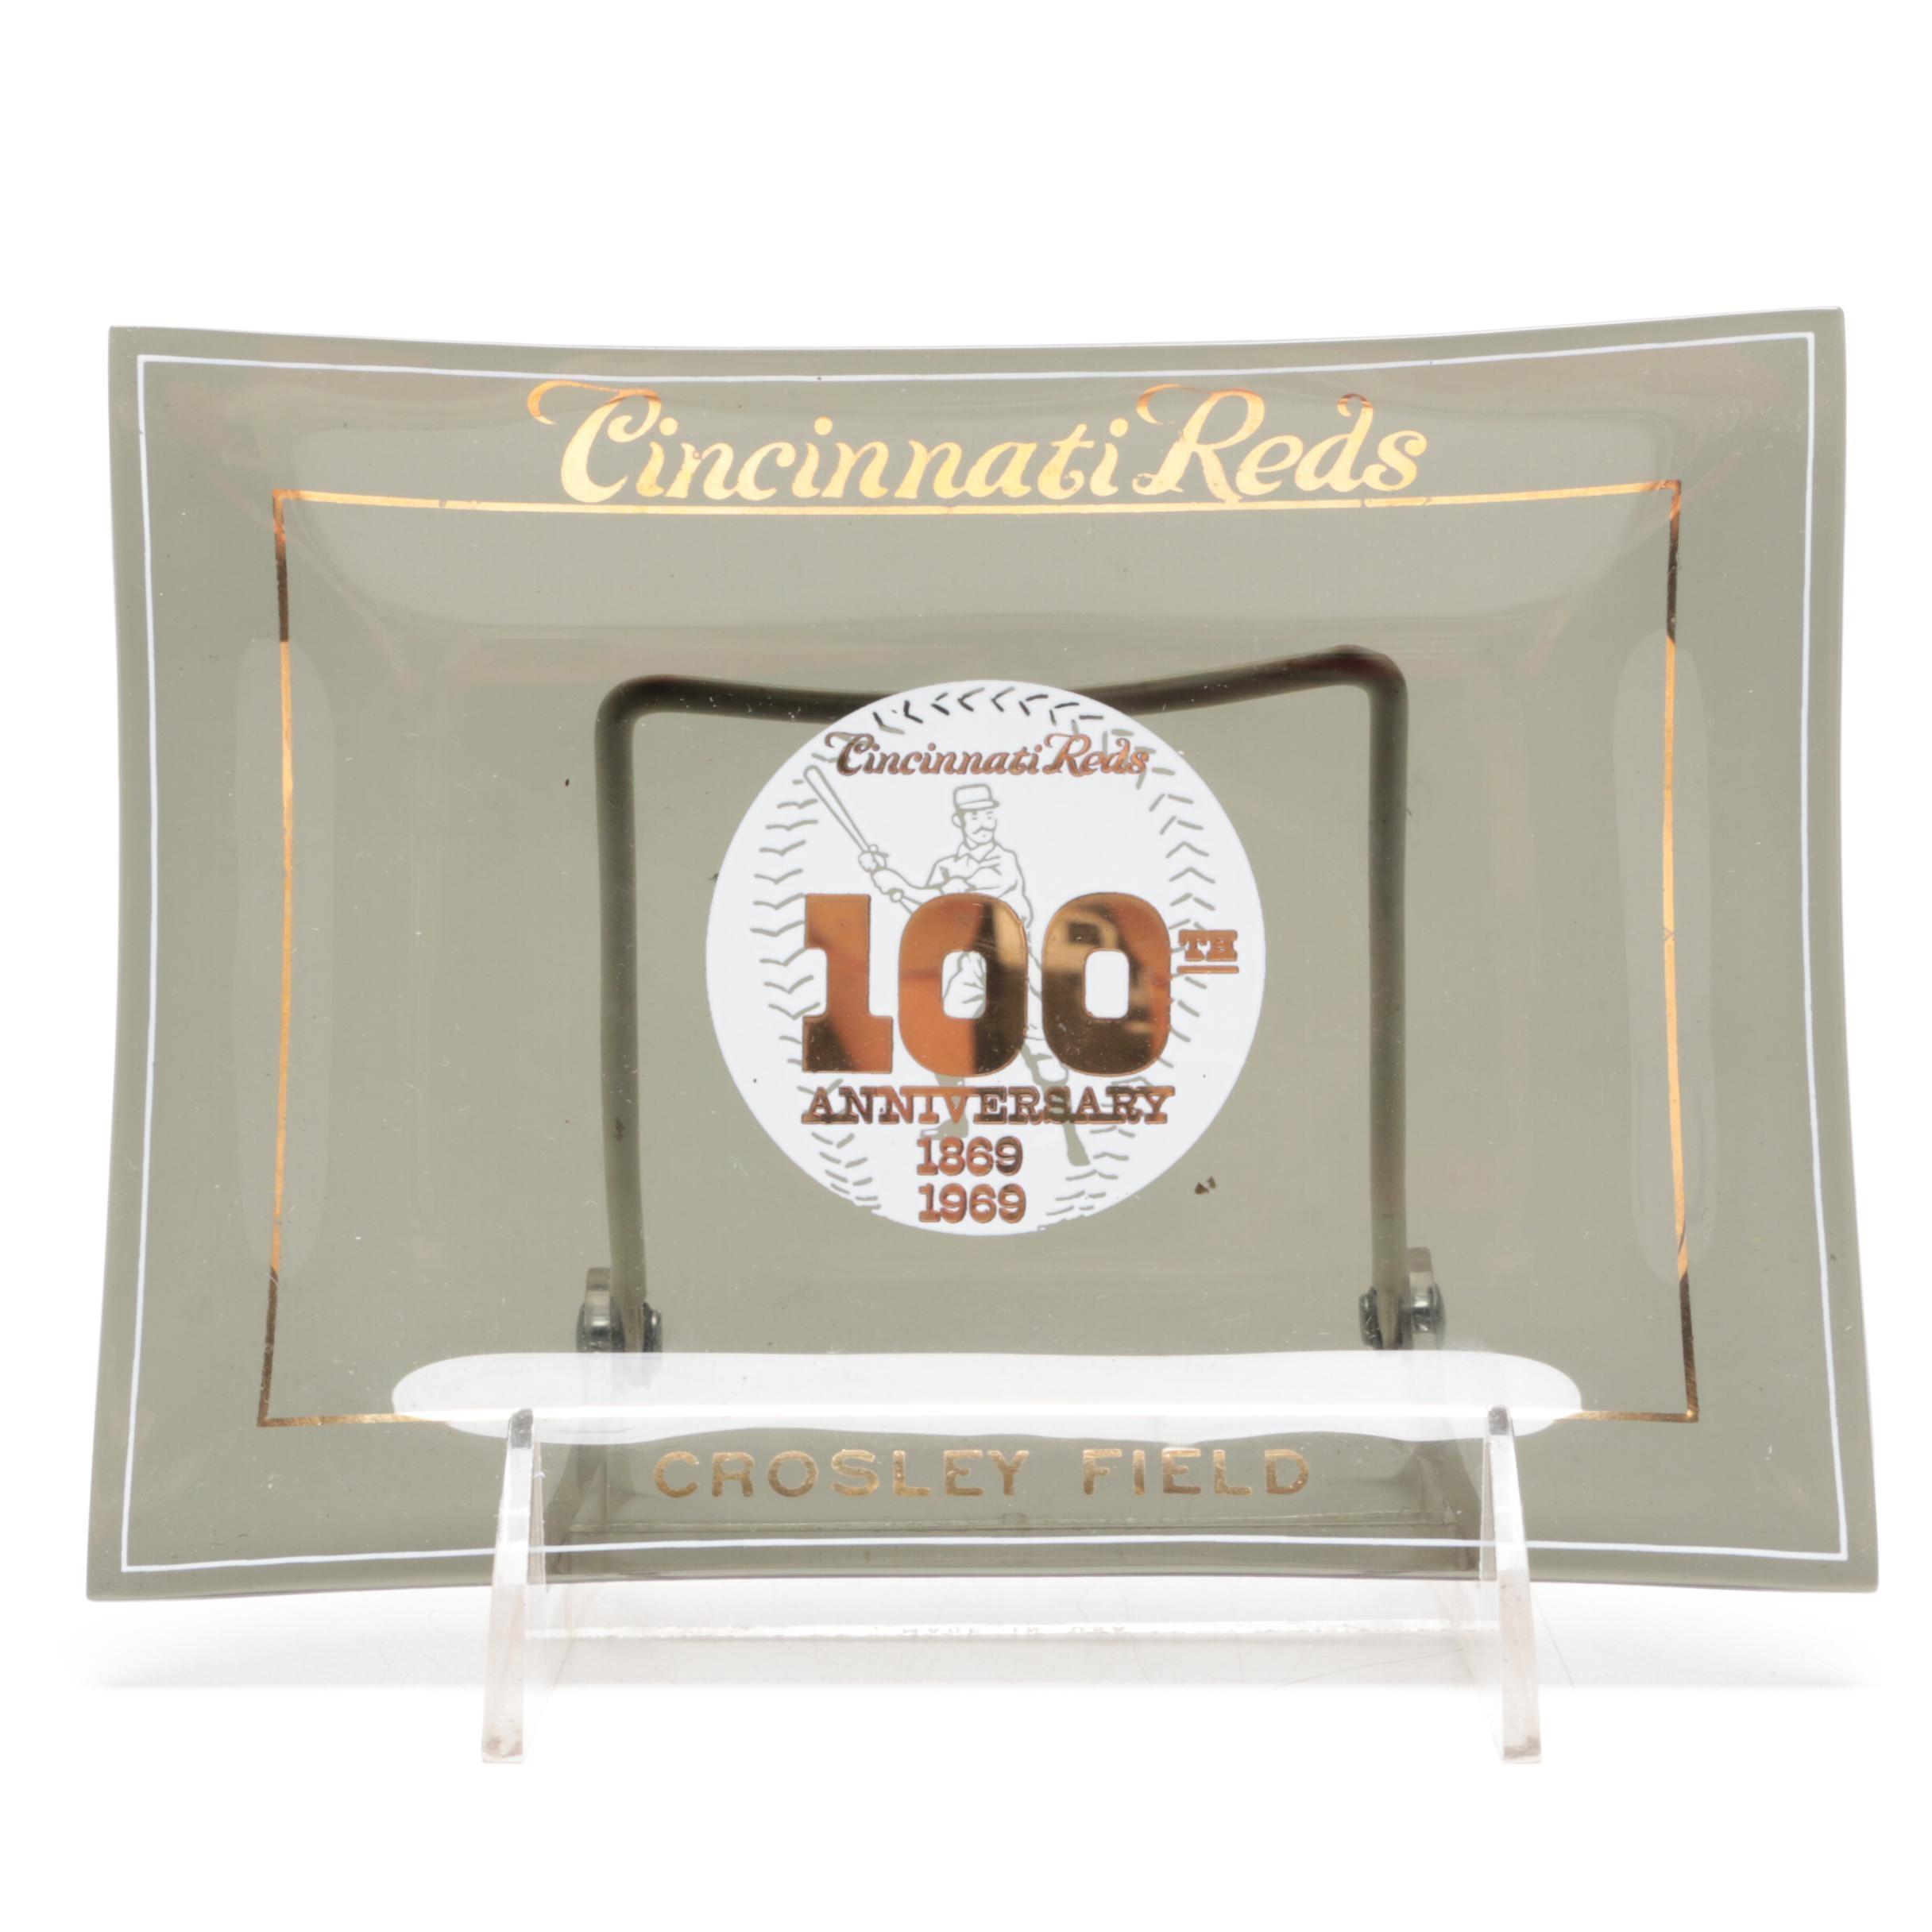 "1969 Crosley Field ""100th Anniversary"" Smoked Glass Tray in Original Box"